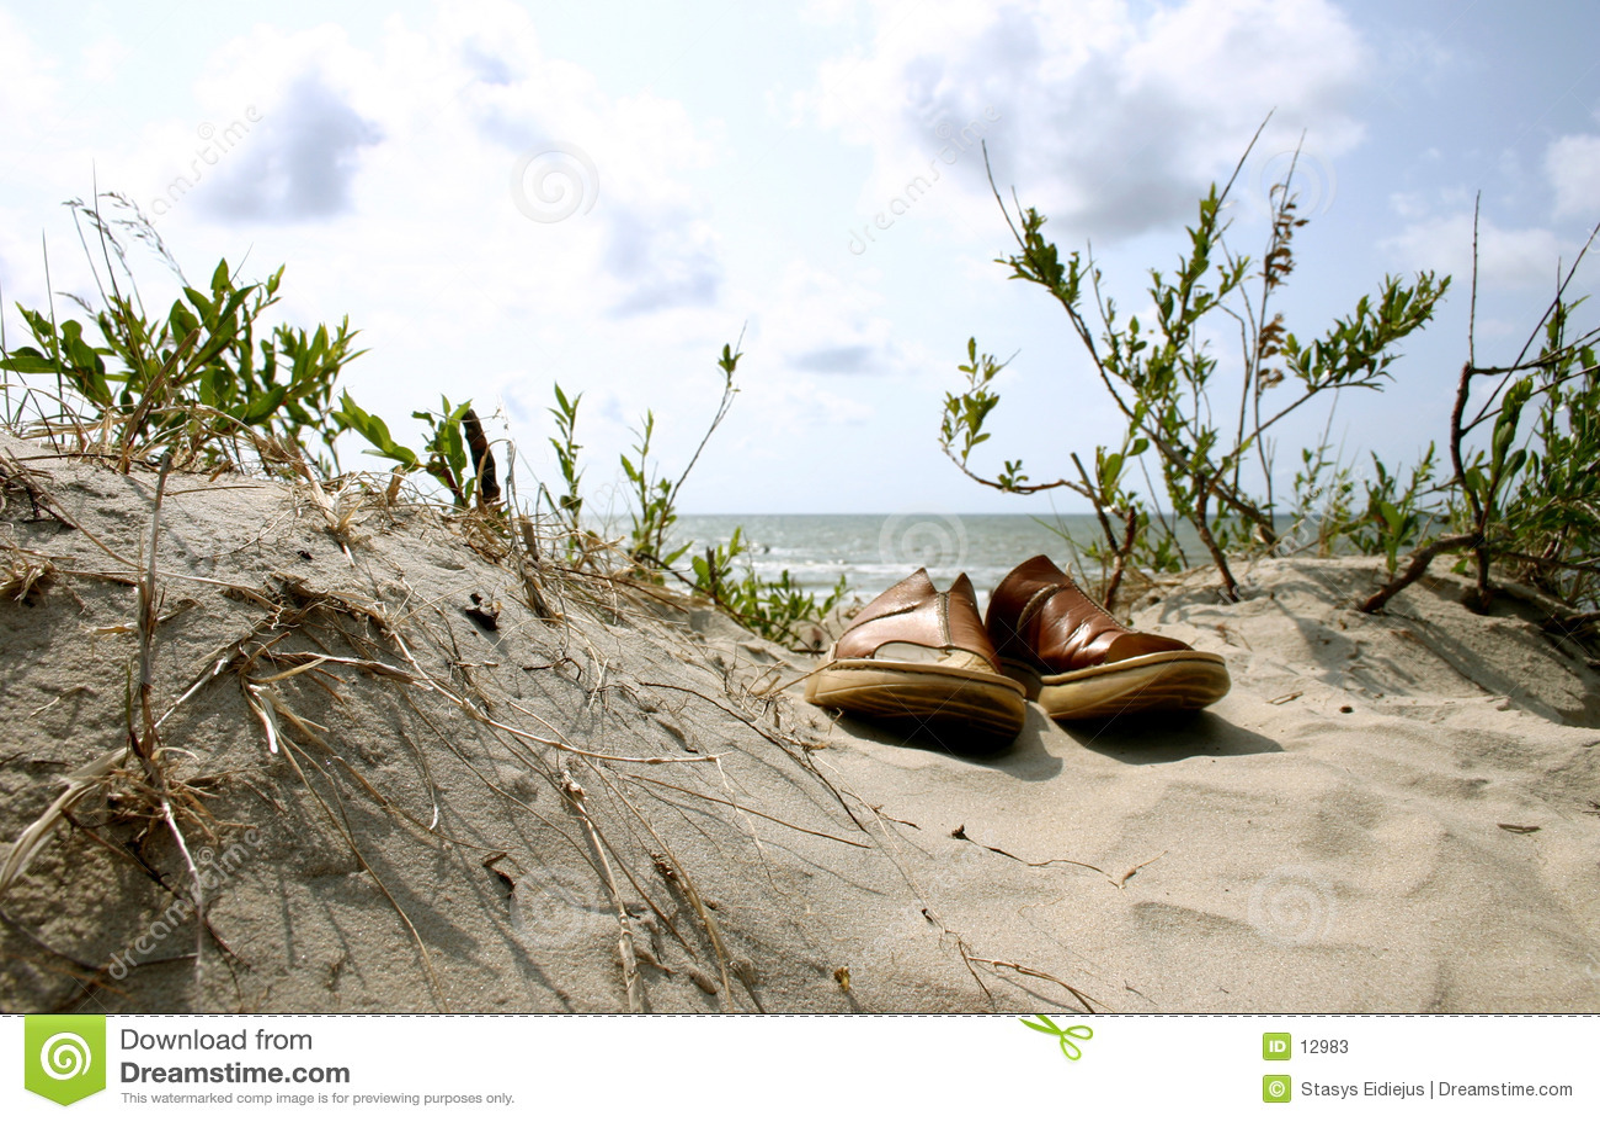 Summer. Beach. Vacation